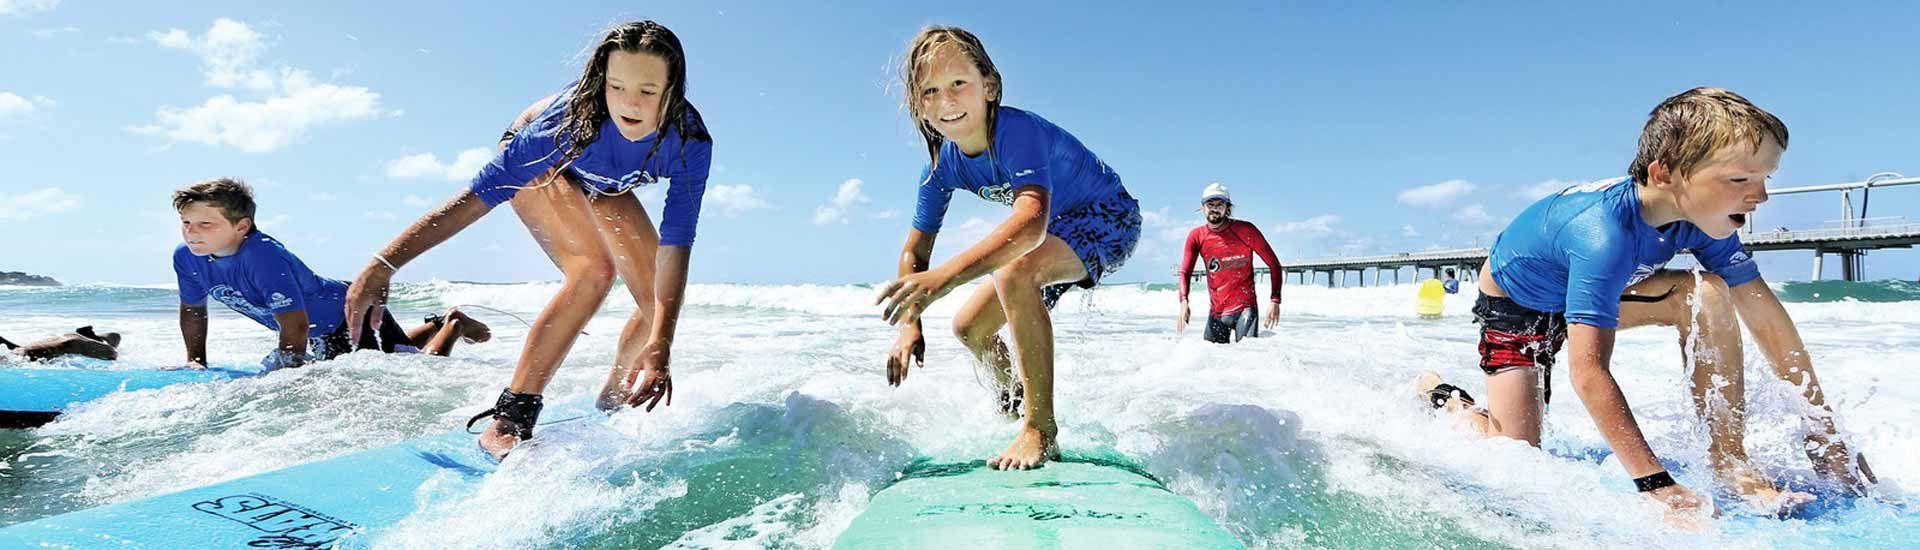 Surf Camp Verano